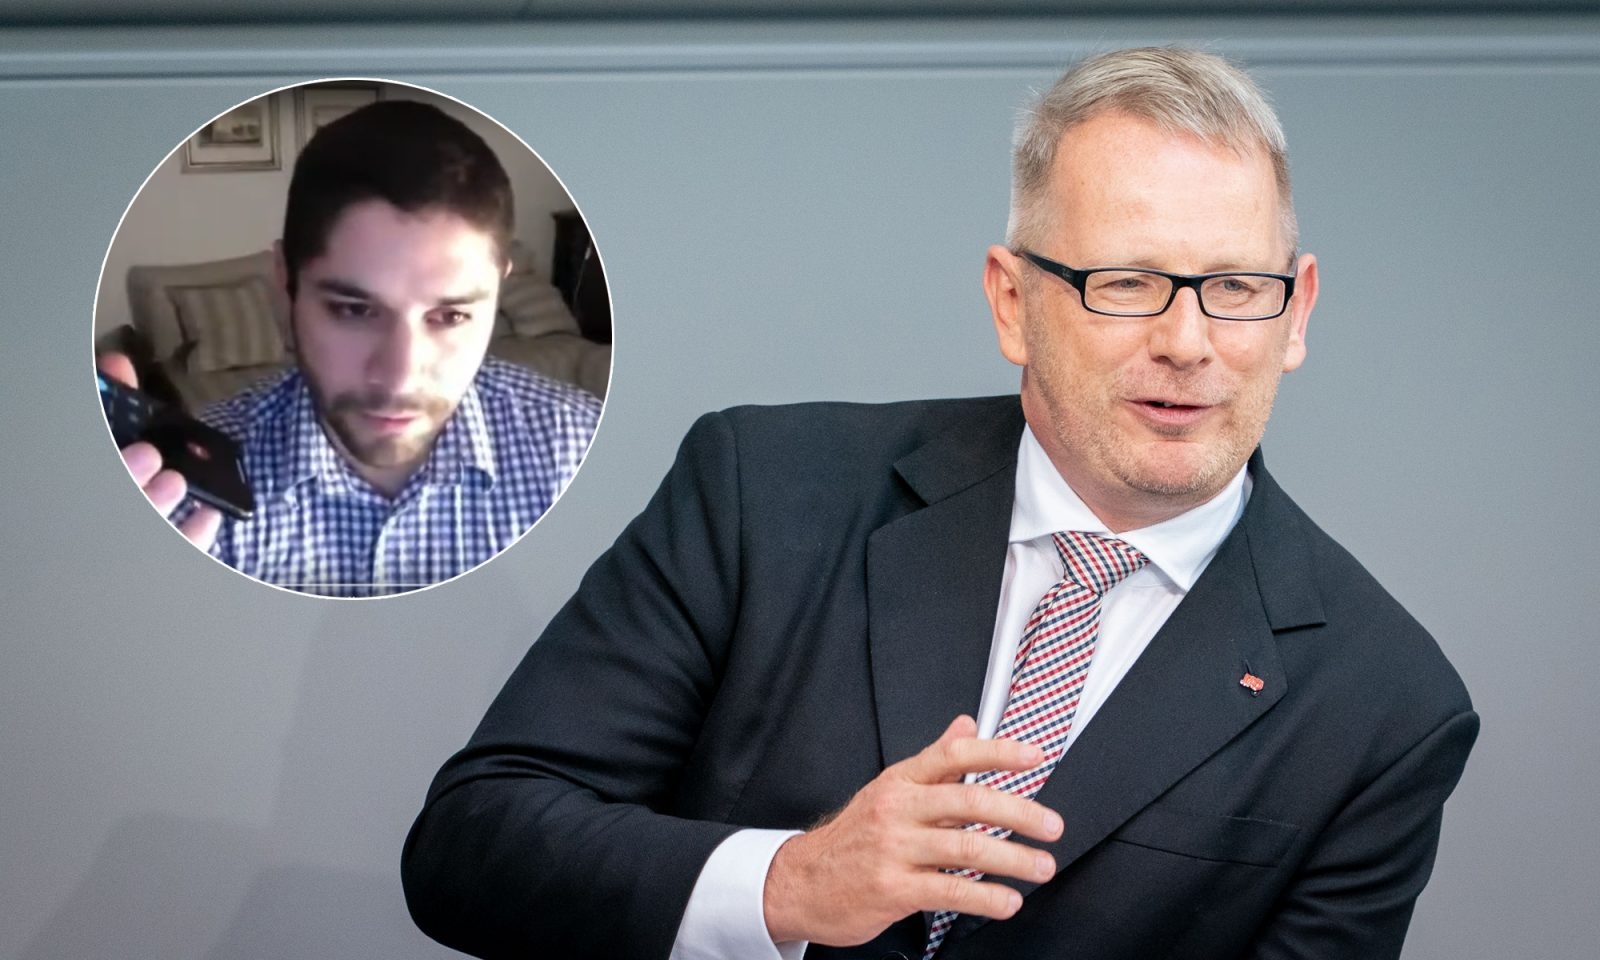 Johannes Kahrs (SPD, r.) und Klemens Kilic